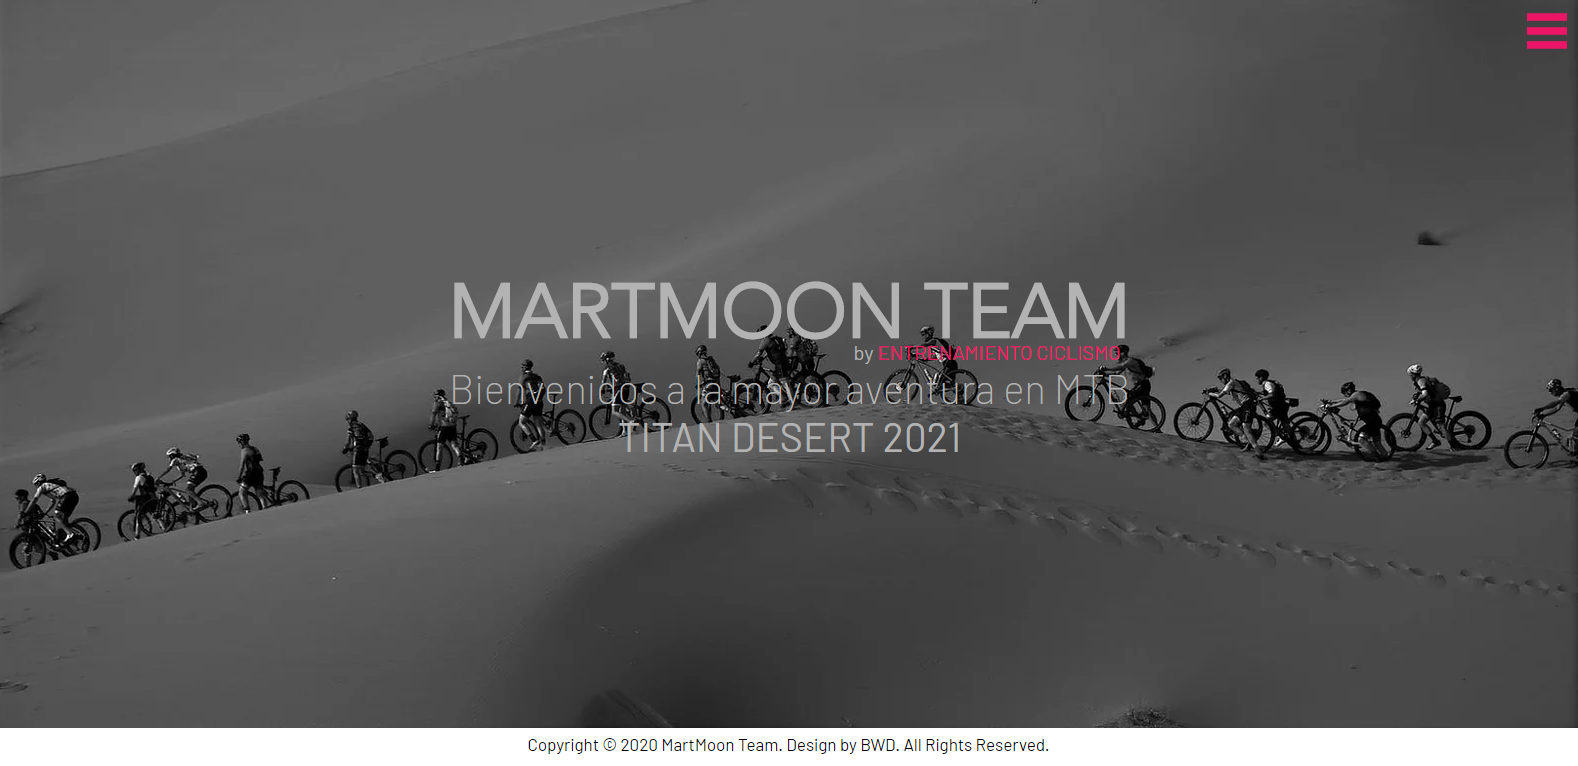 MARTMOON TEAM